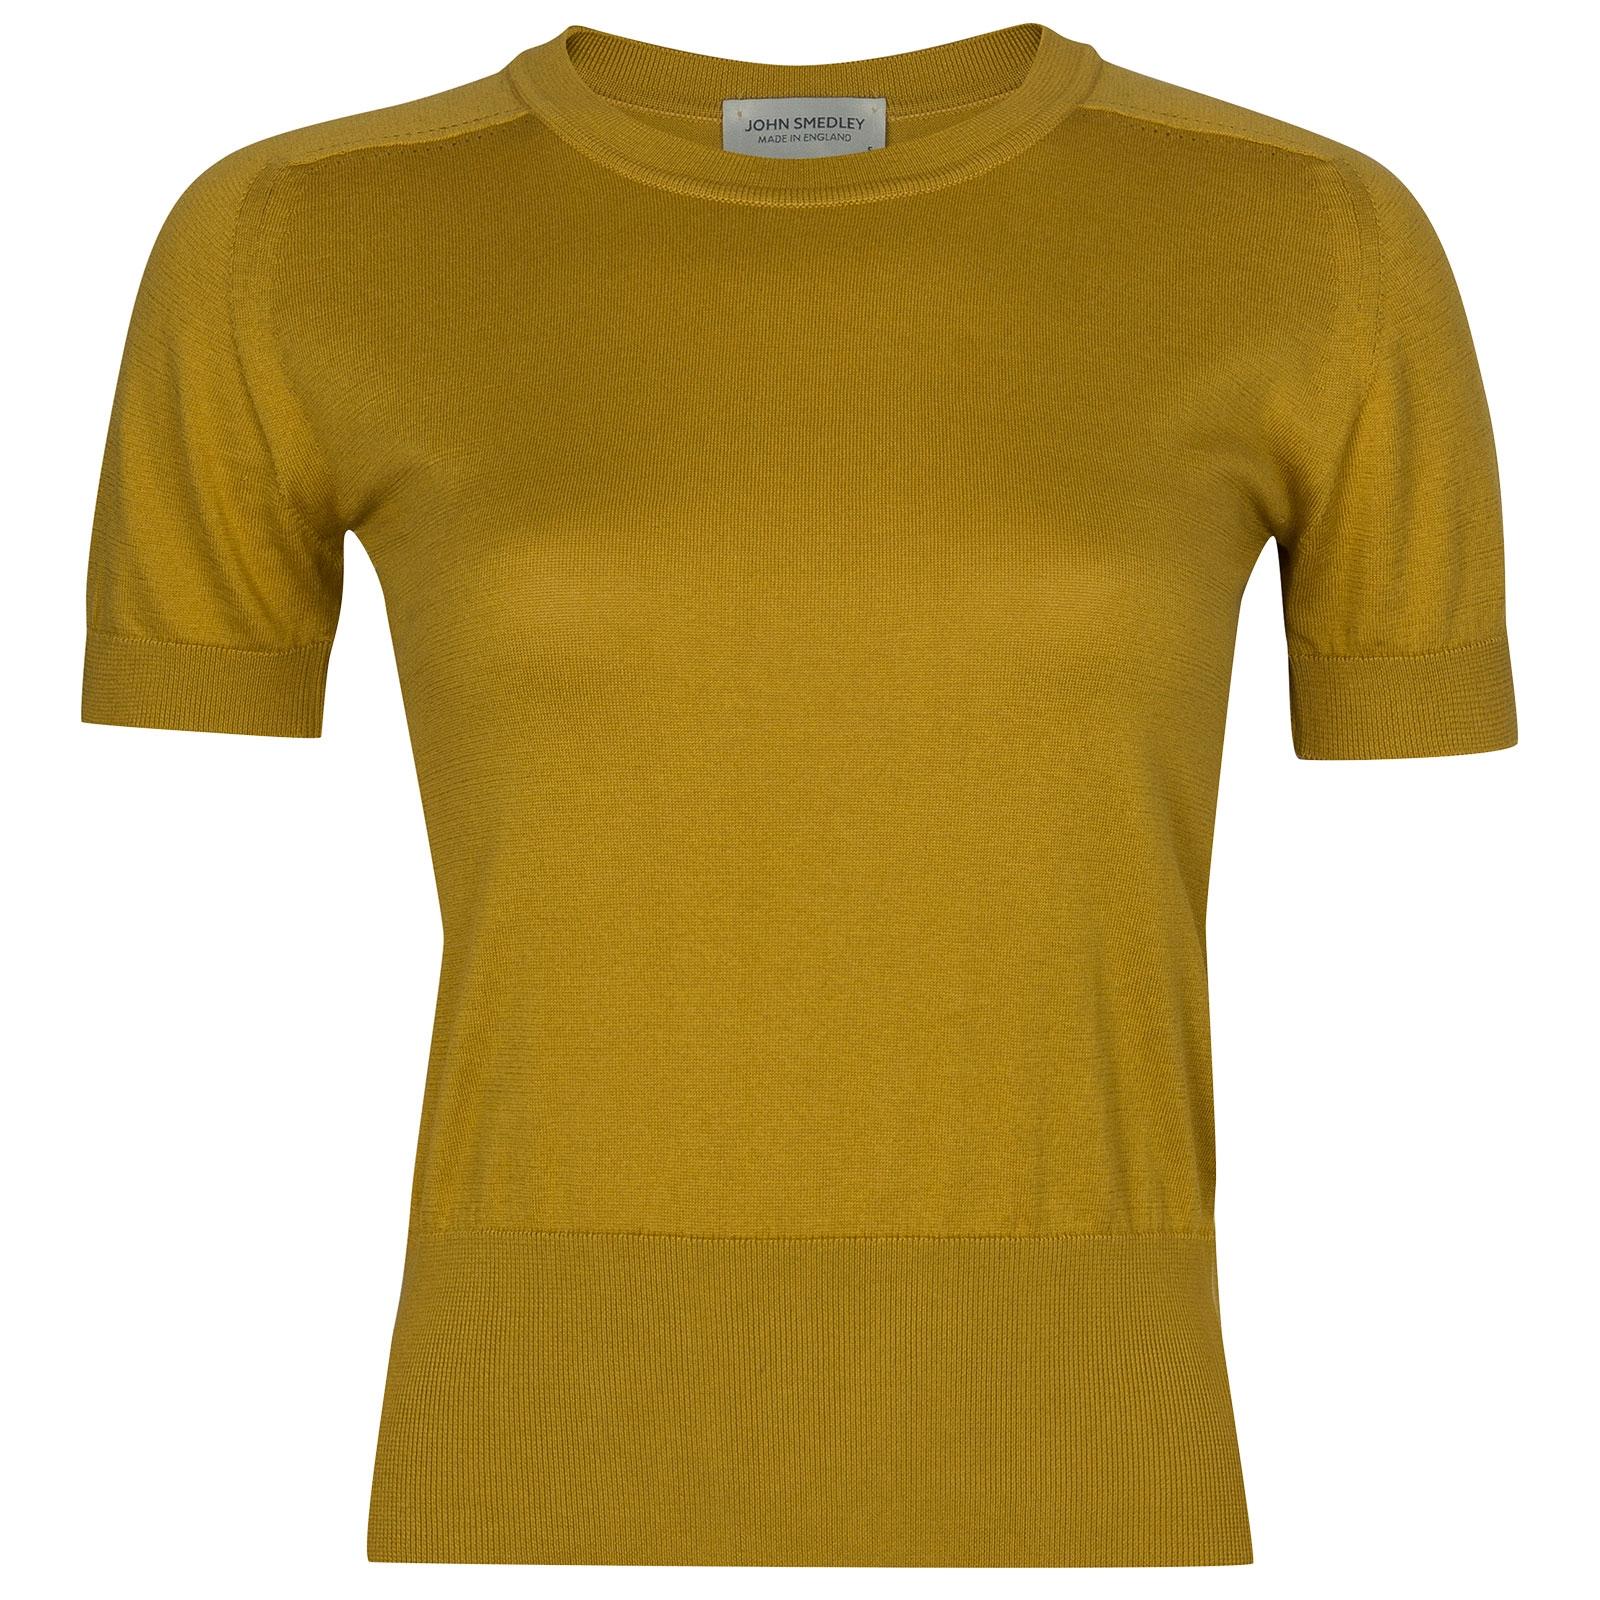 John Smedley Novia in Stamen Yellow Sweater-SML